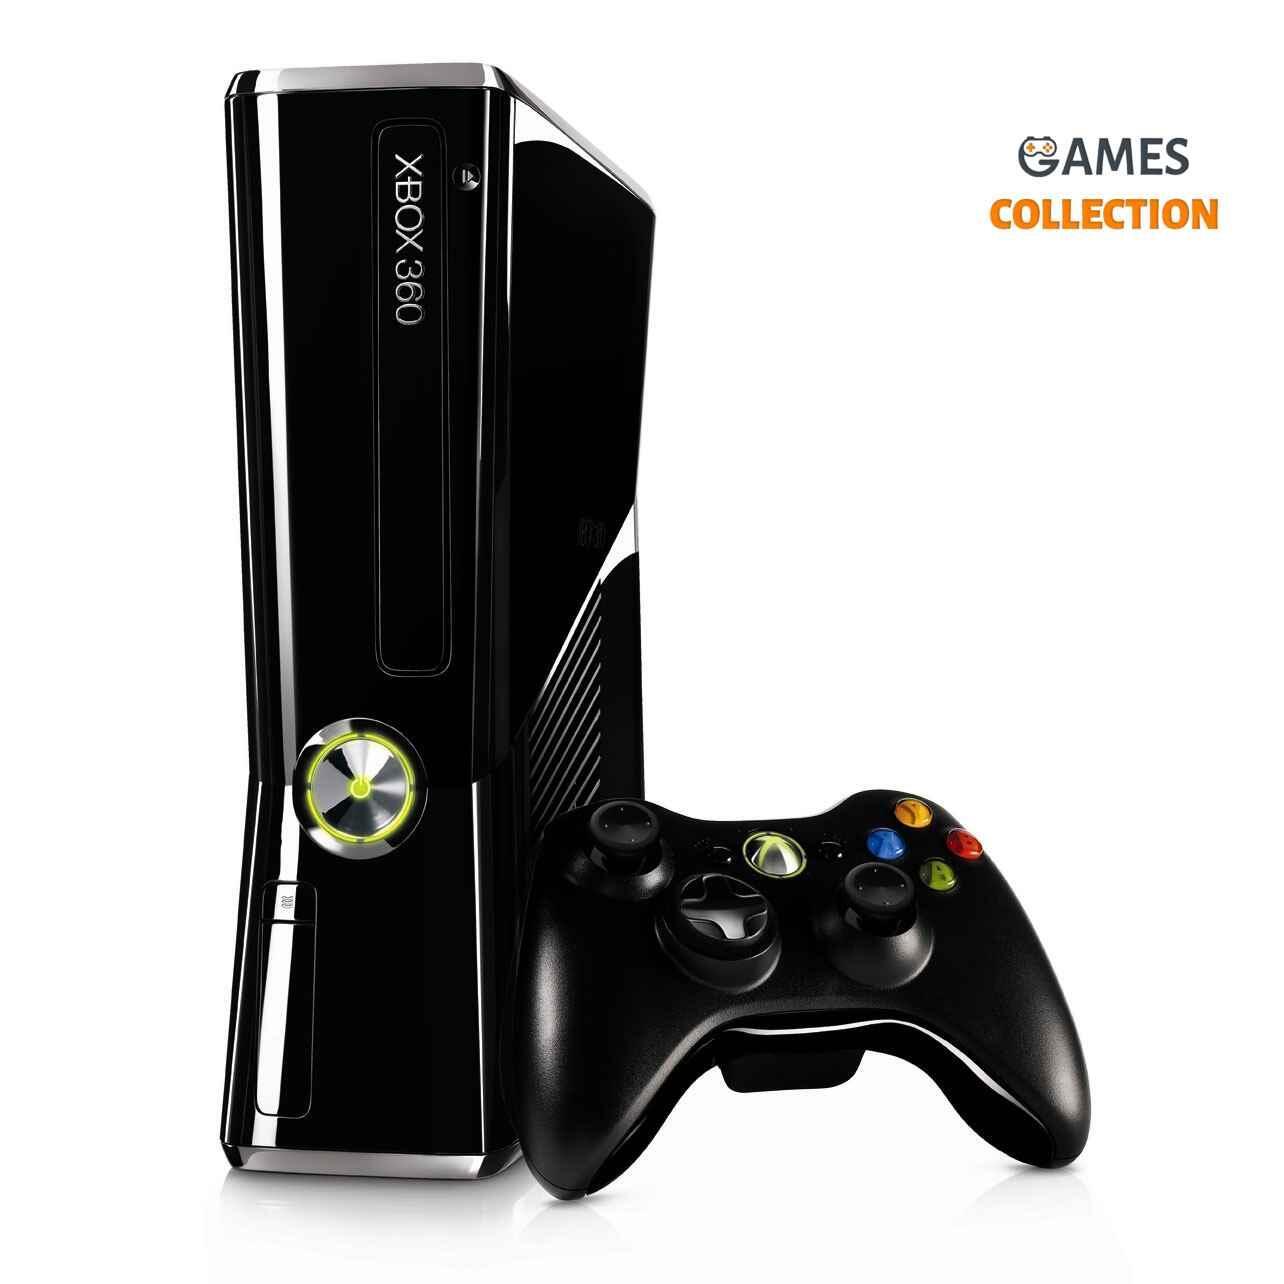 Xbox 360 Slim 500GB (Прошивка Freeboot) 100 лучших игр в комплекте-thumb